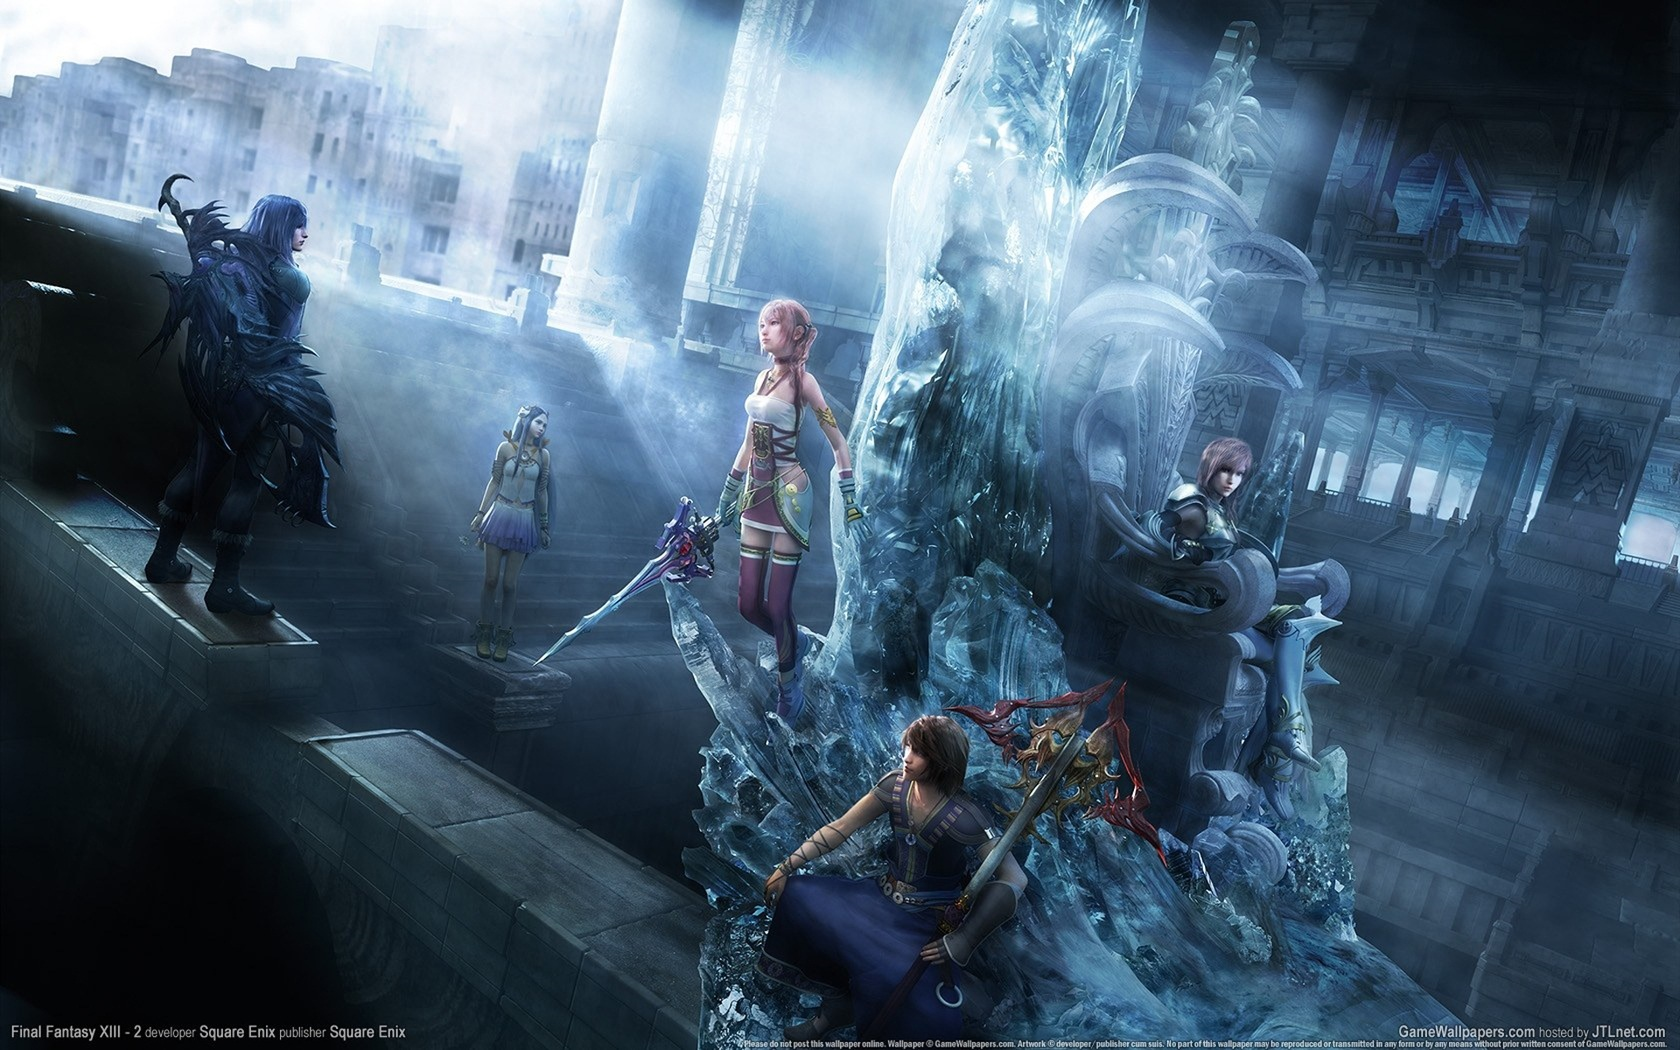 Final Fantasy Xv Royal Edition Hd Games 4k Wallpapers: 壁紙 ファイナルファンタジーXIII-2のPCゲーム 1680x1050 HD 無料のデスクトップの背景, 画像